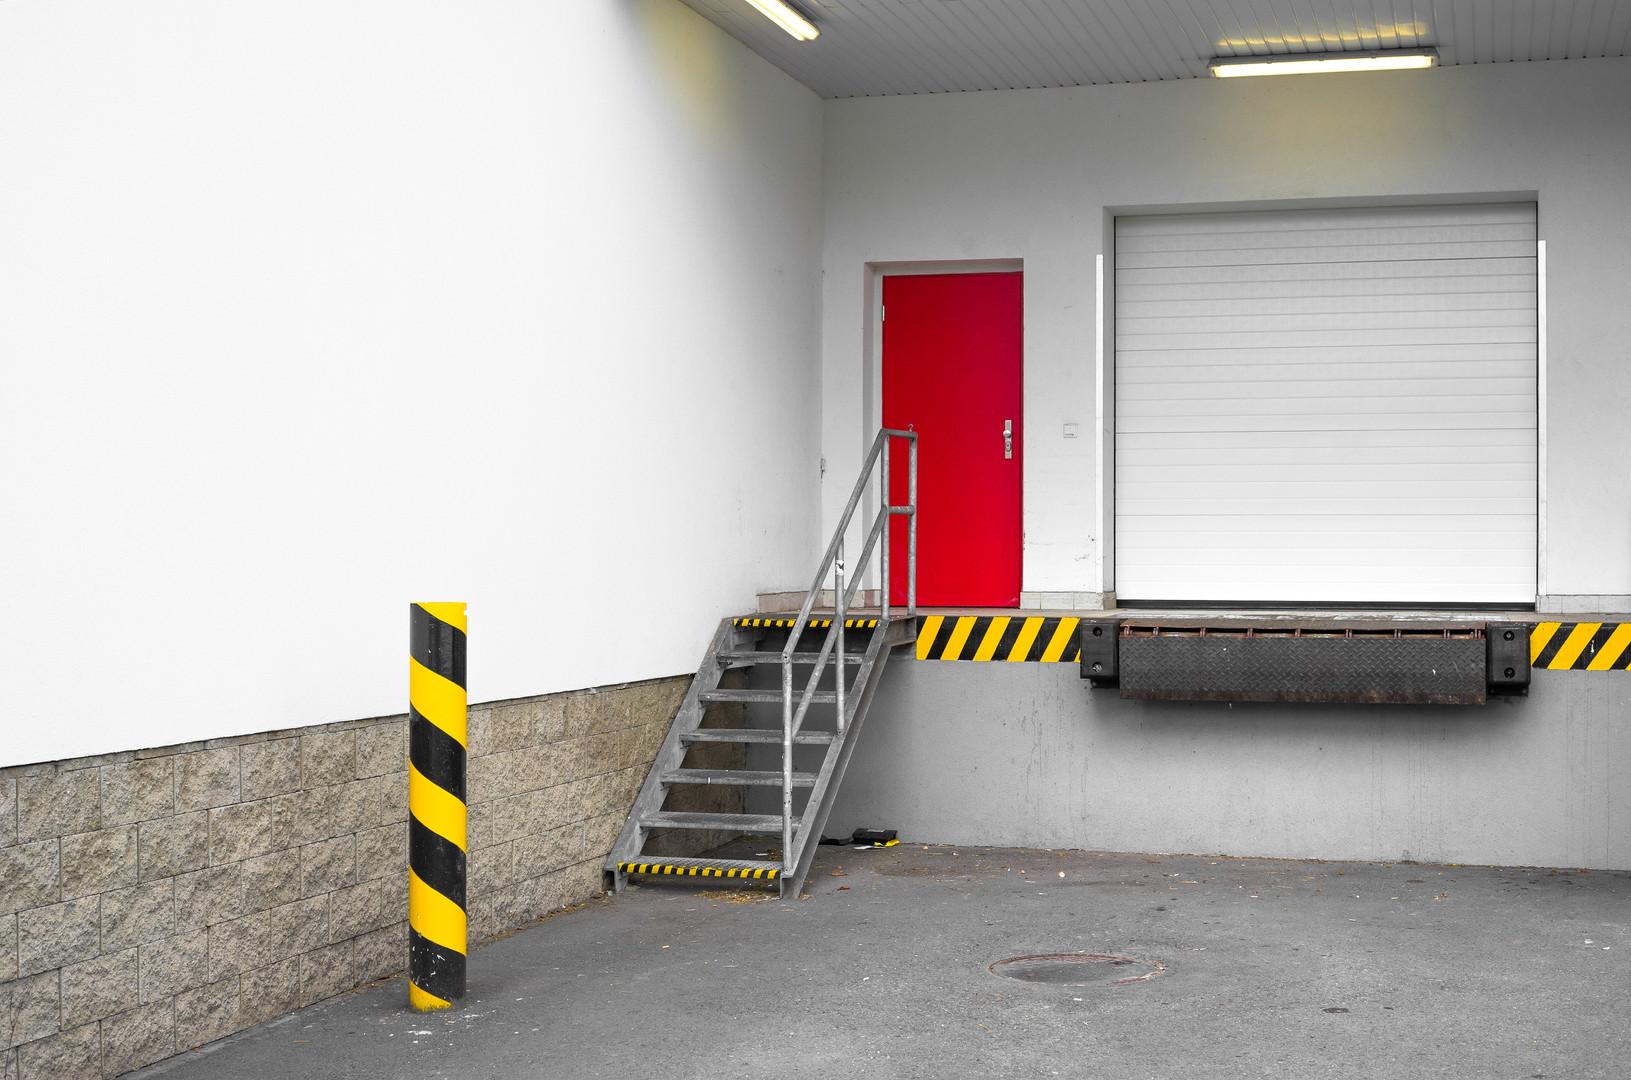 Loading dock for loading and unloading o